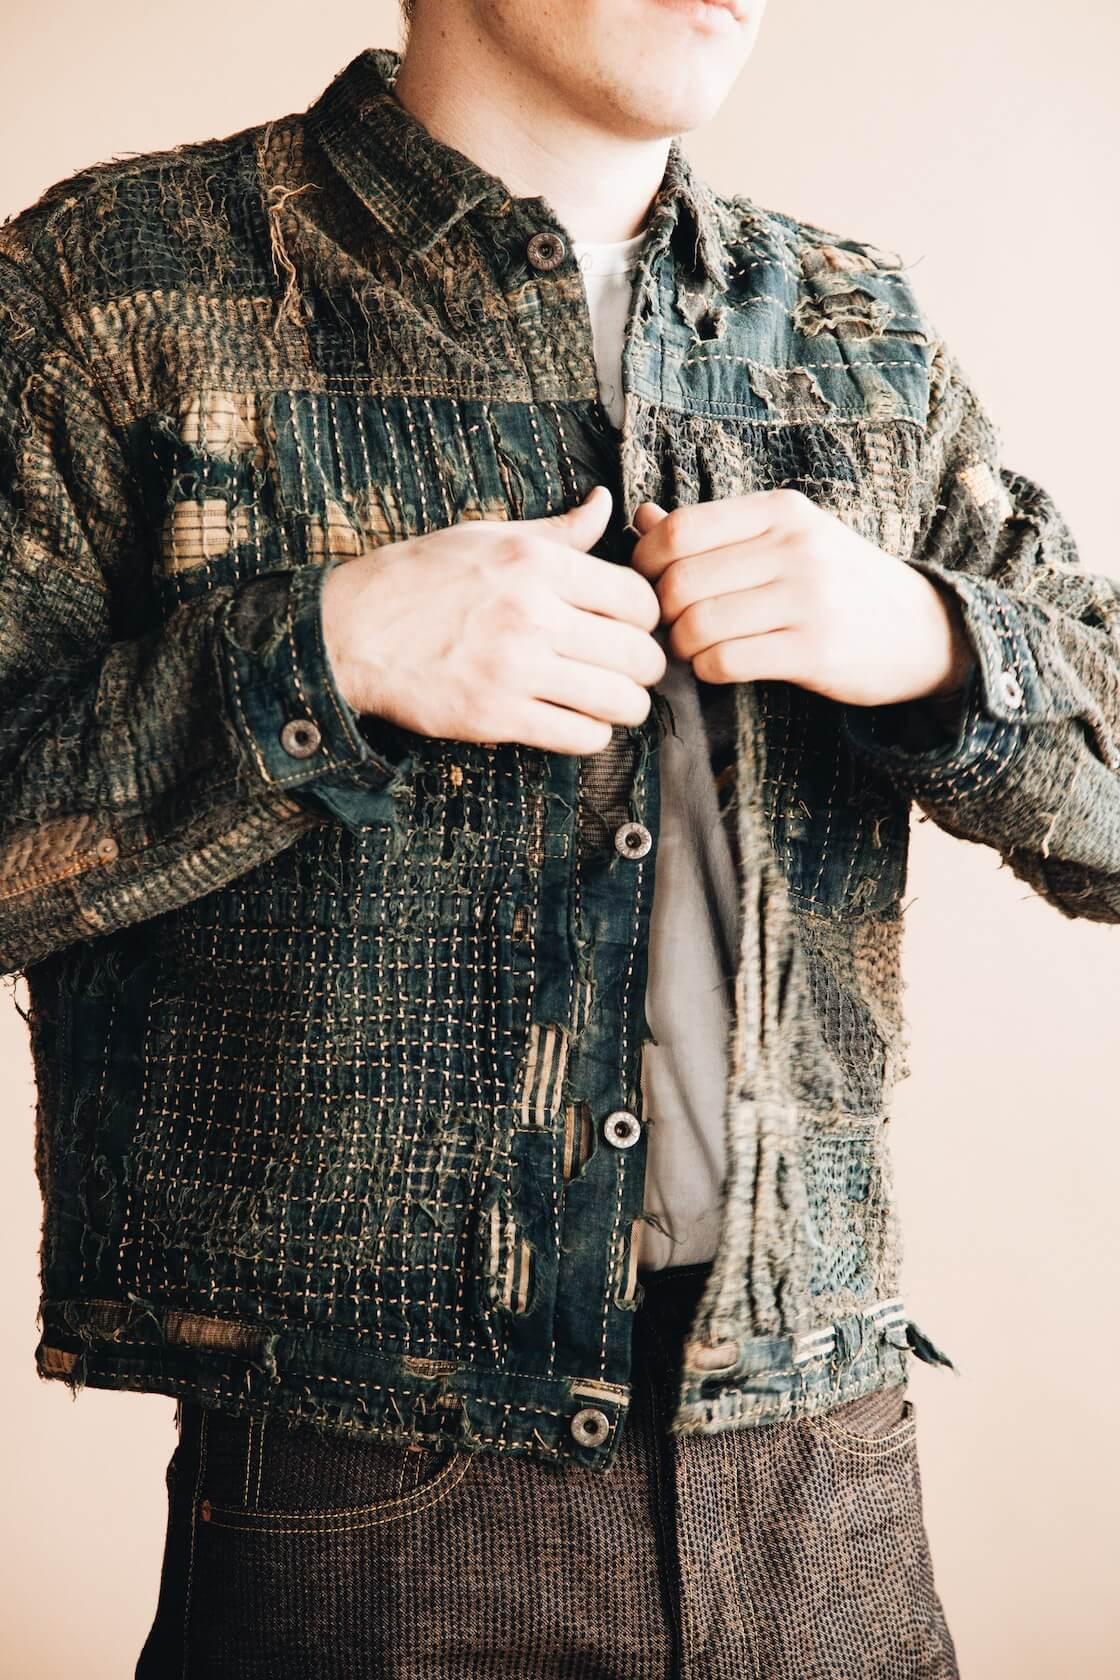 kapital boro first jacket and century denim pants on body